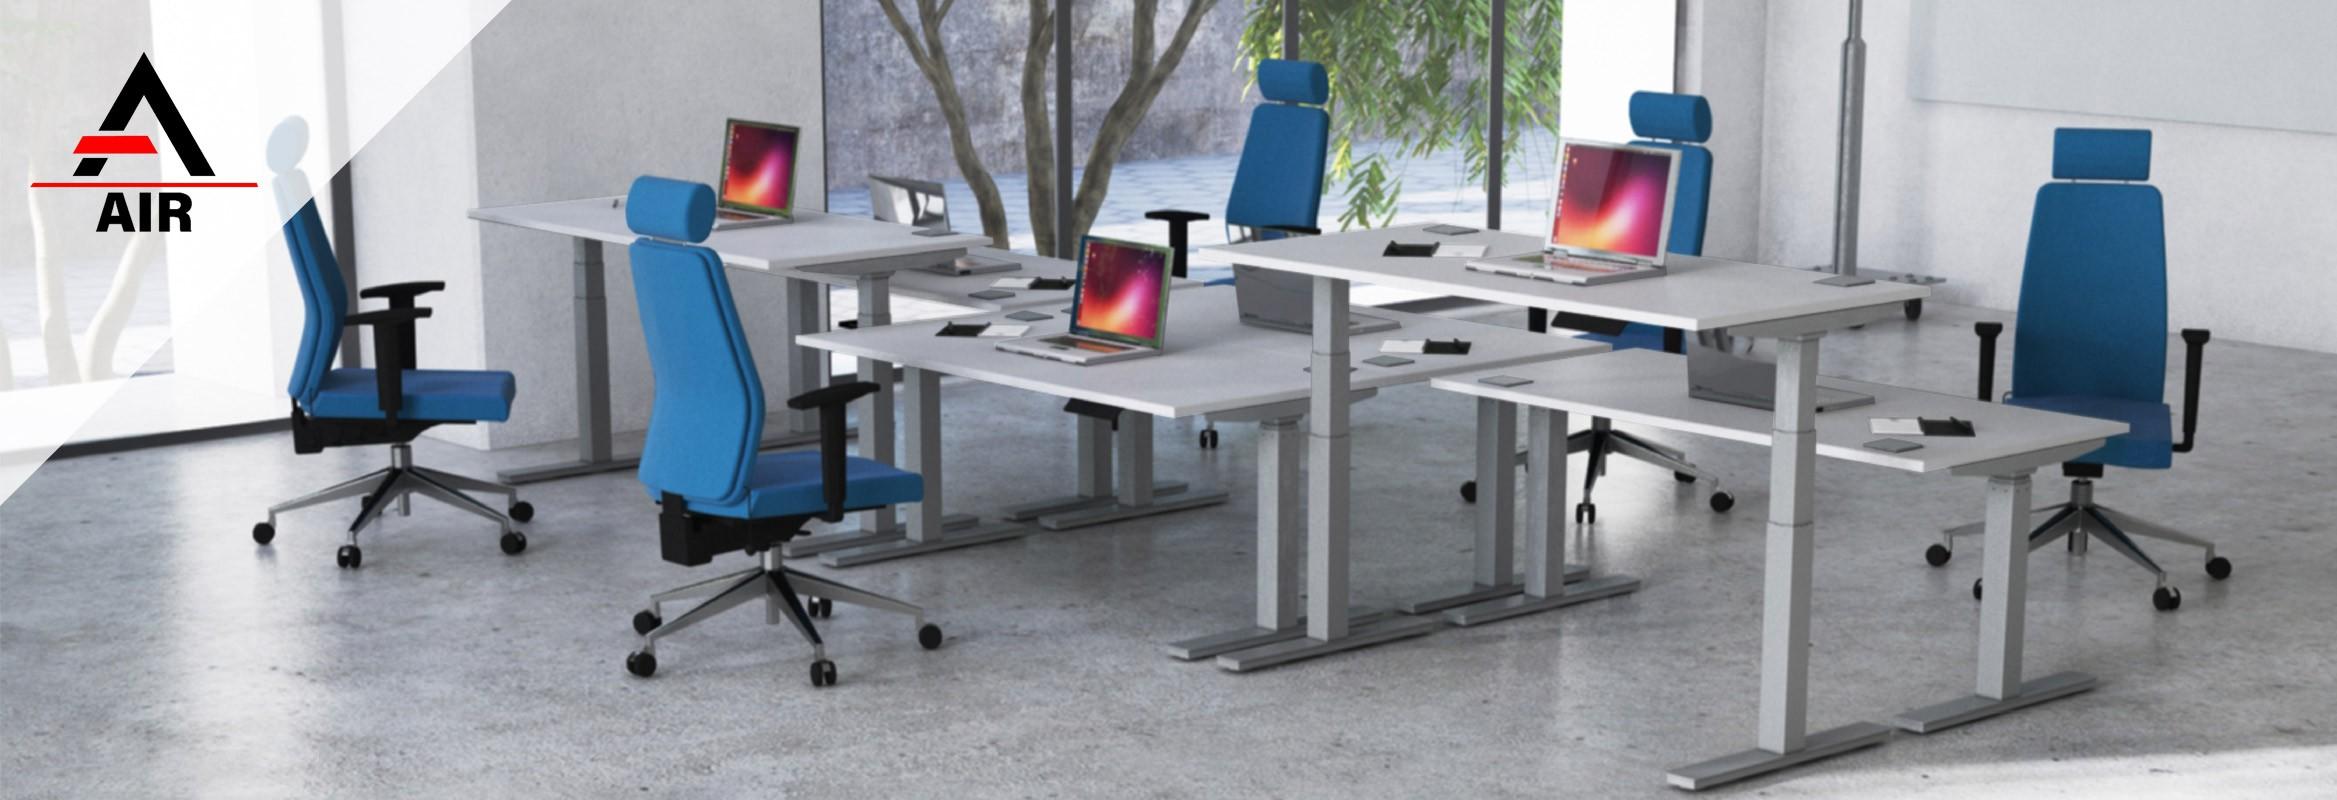 Air Height-Adjustable Desks